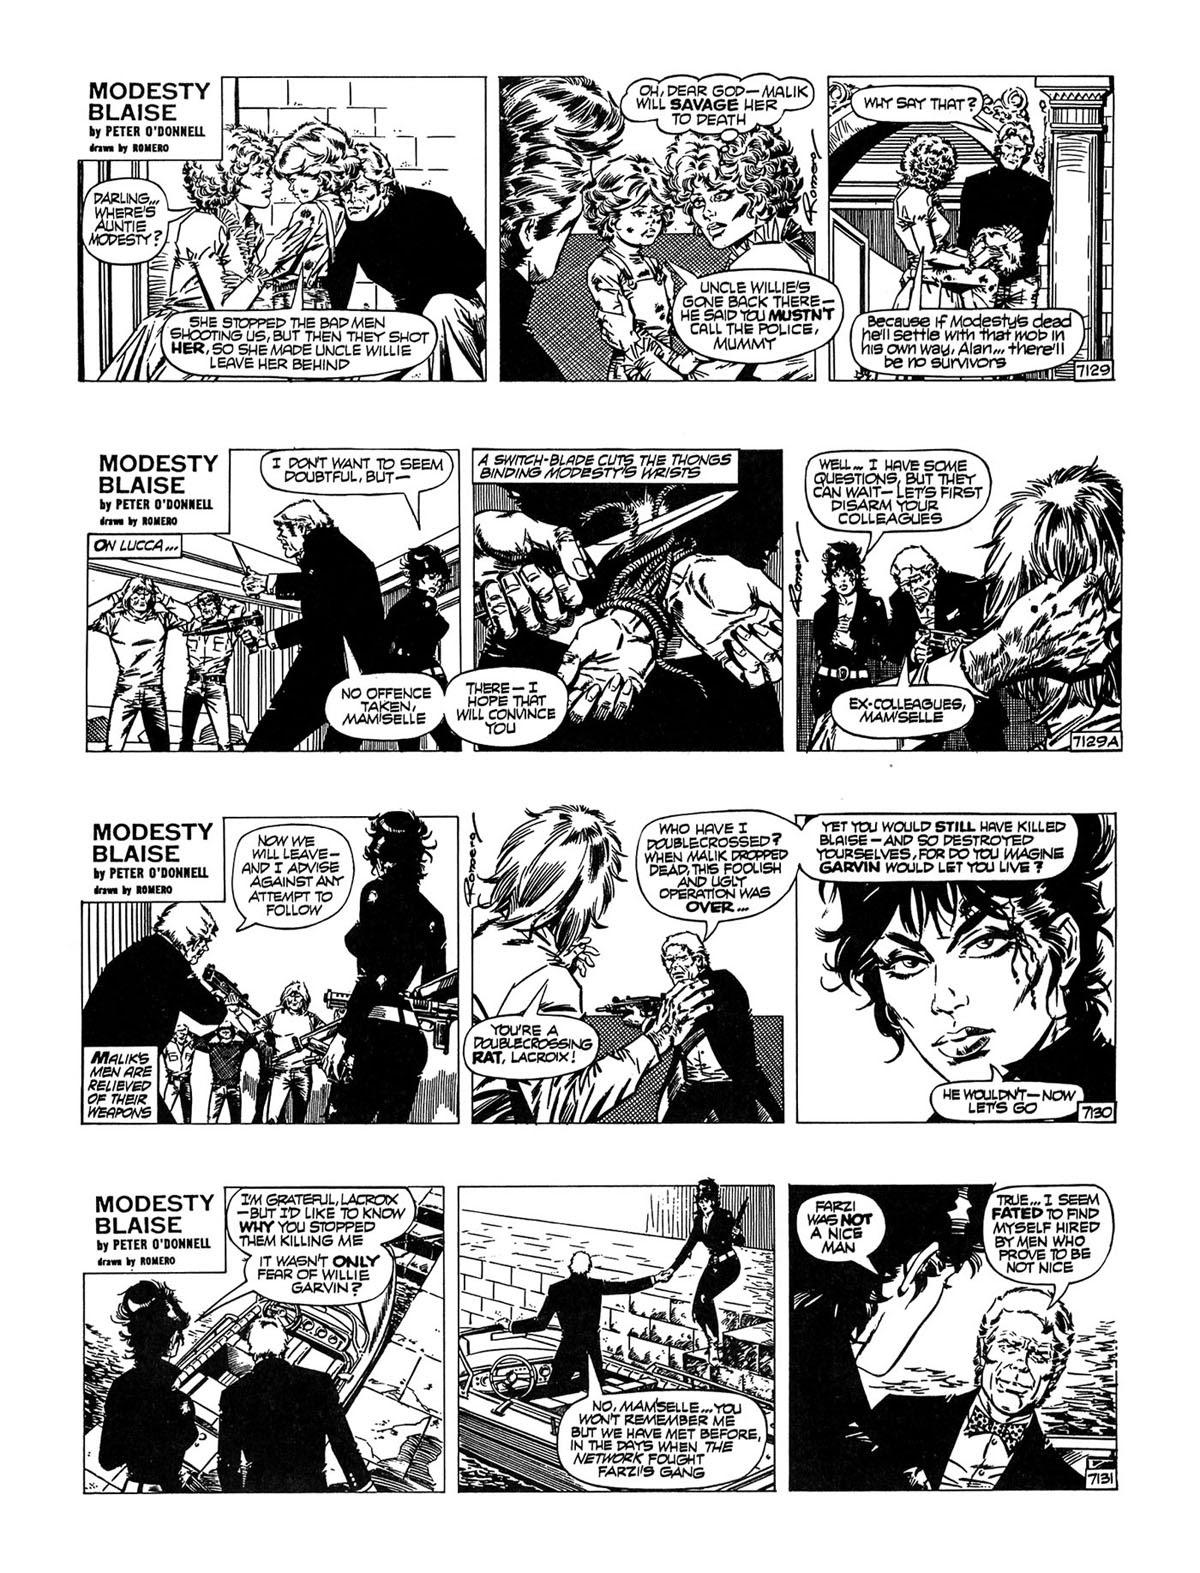 Read online Modesty Blaise Live bait comic -  Issue # TPB - 30